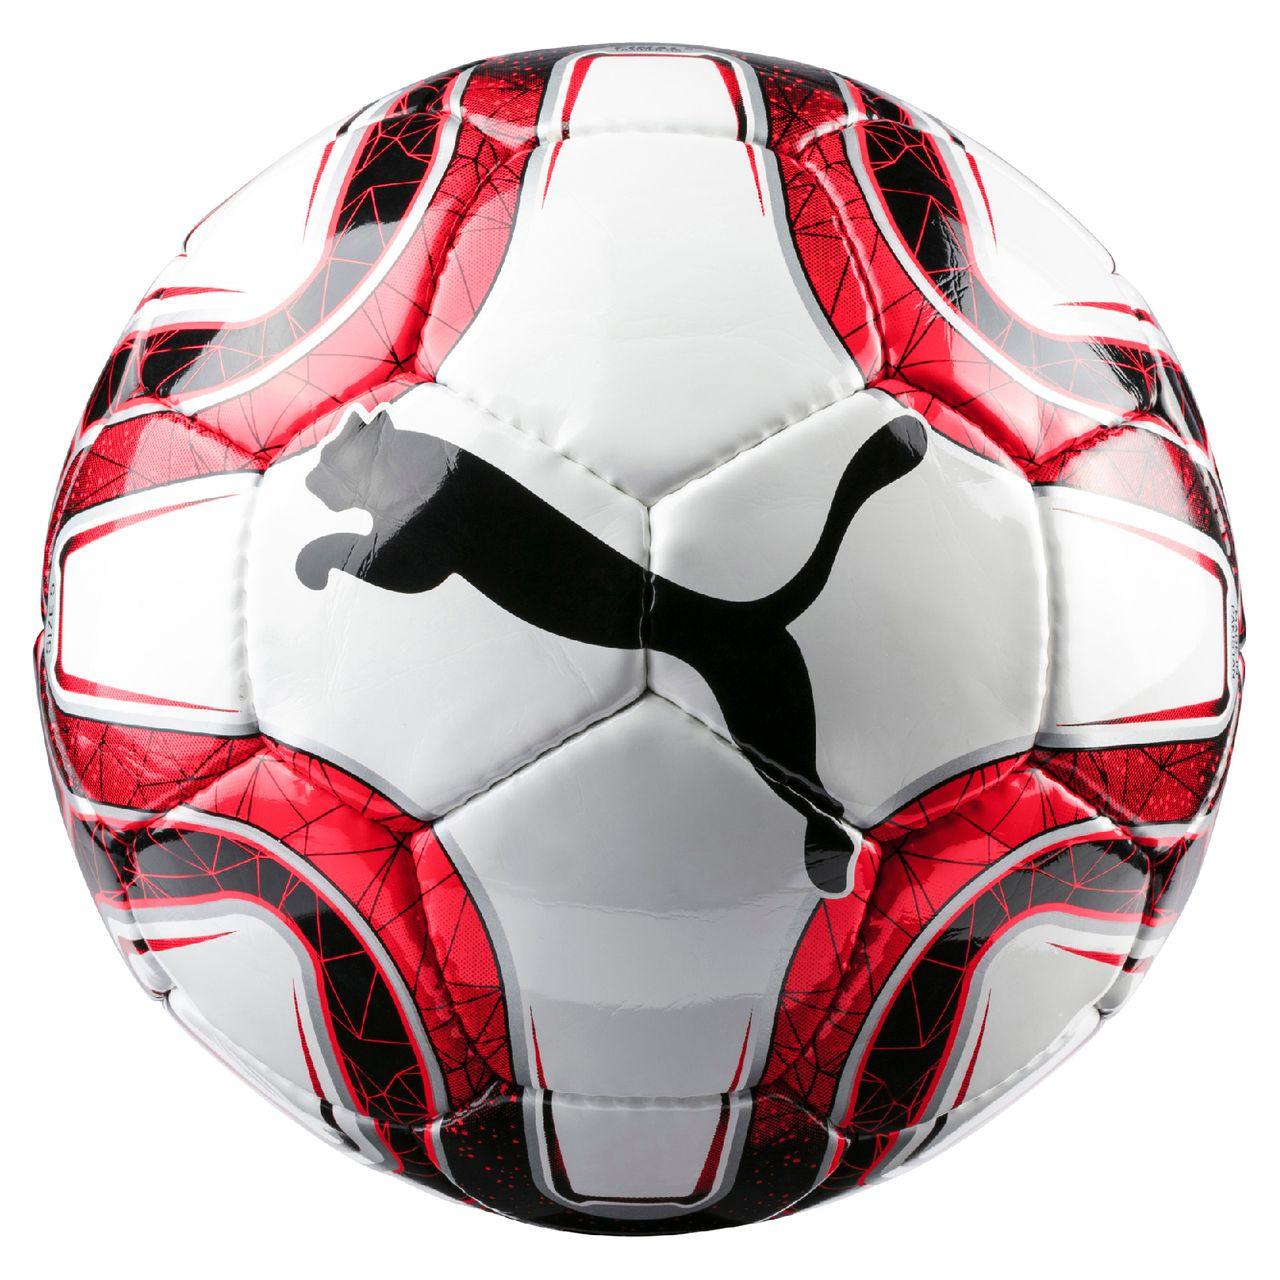 10 x PUMA Trainingsball - FINAL 5 HS Trainer inkl. Ballsack